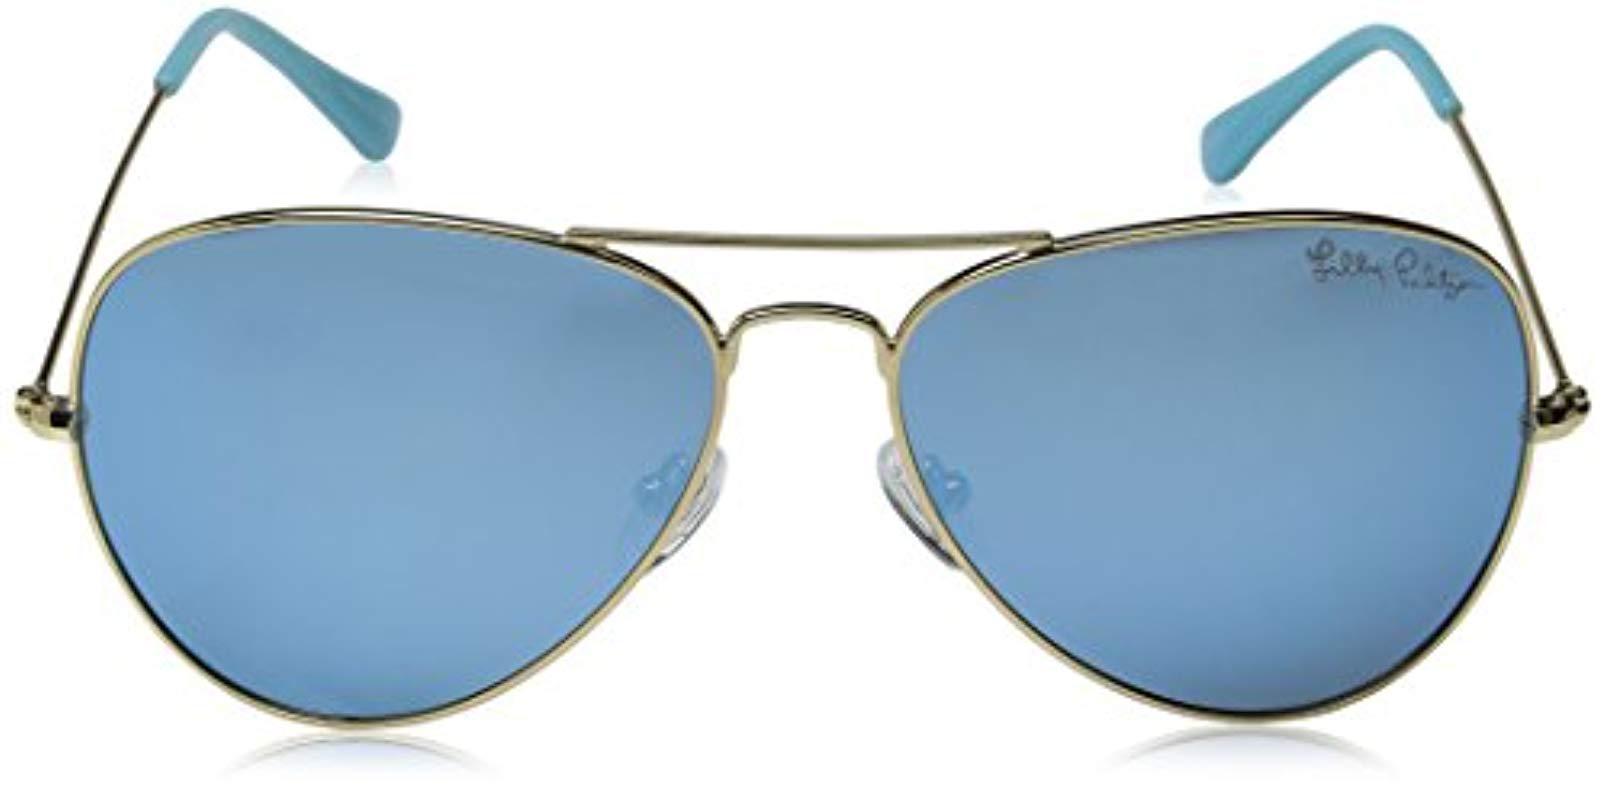 6843db97708 Lilly Pulitzer - Blue Lexy Lexysb59 Polarized Aviator Sunglasses - Lyst.  View fullscreen